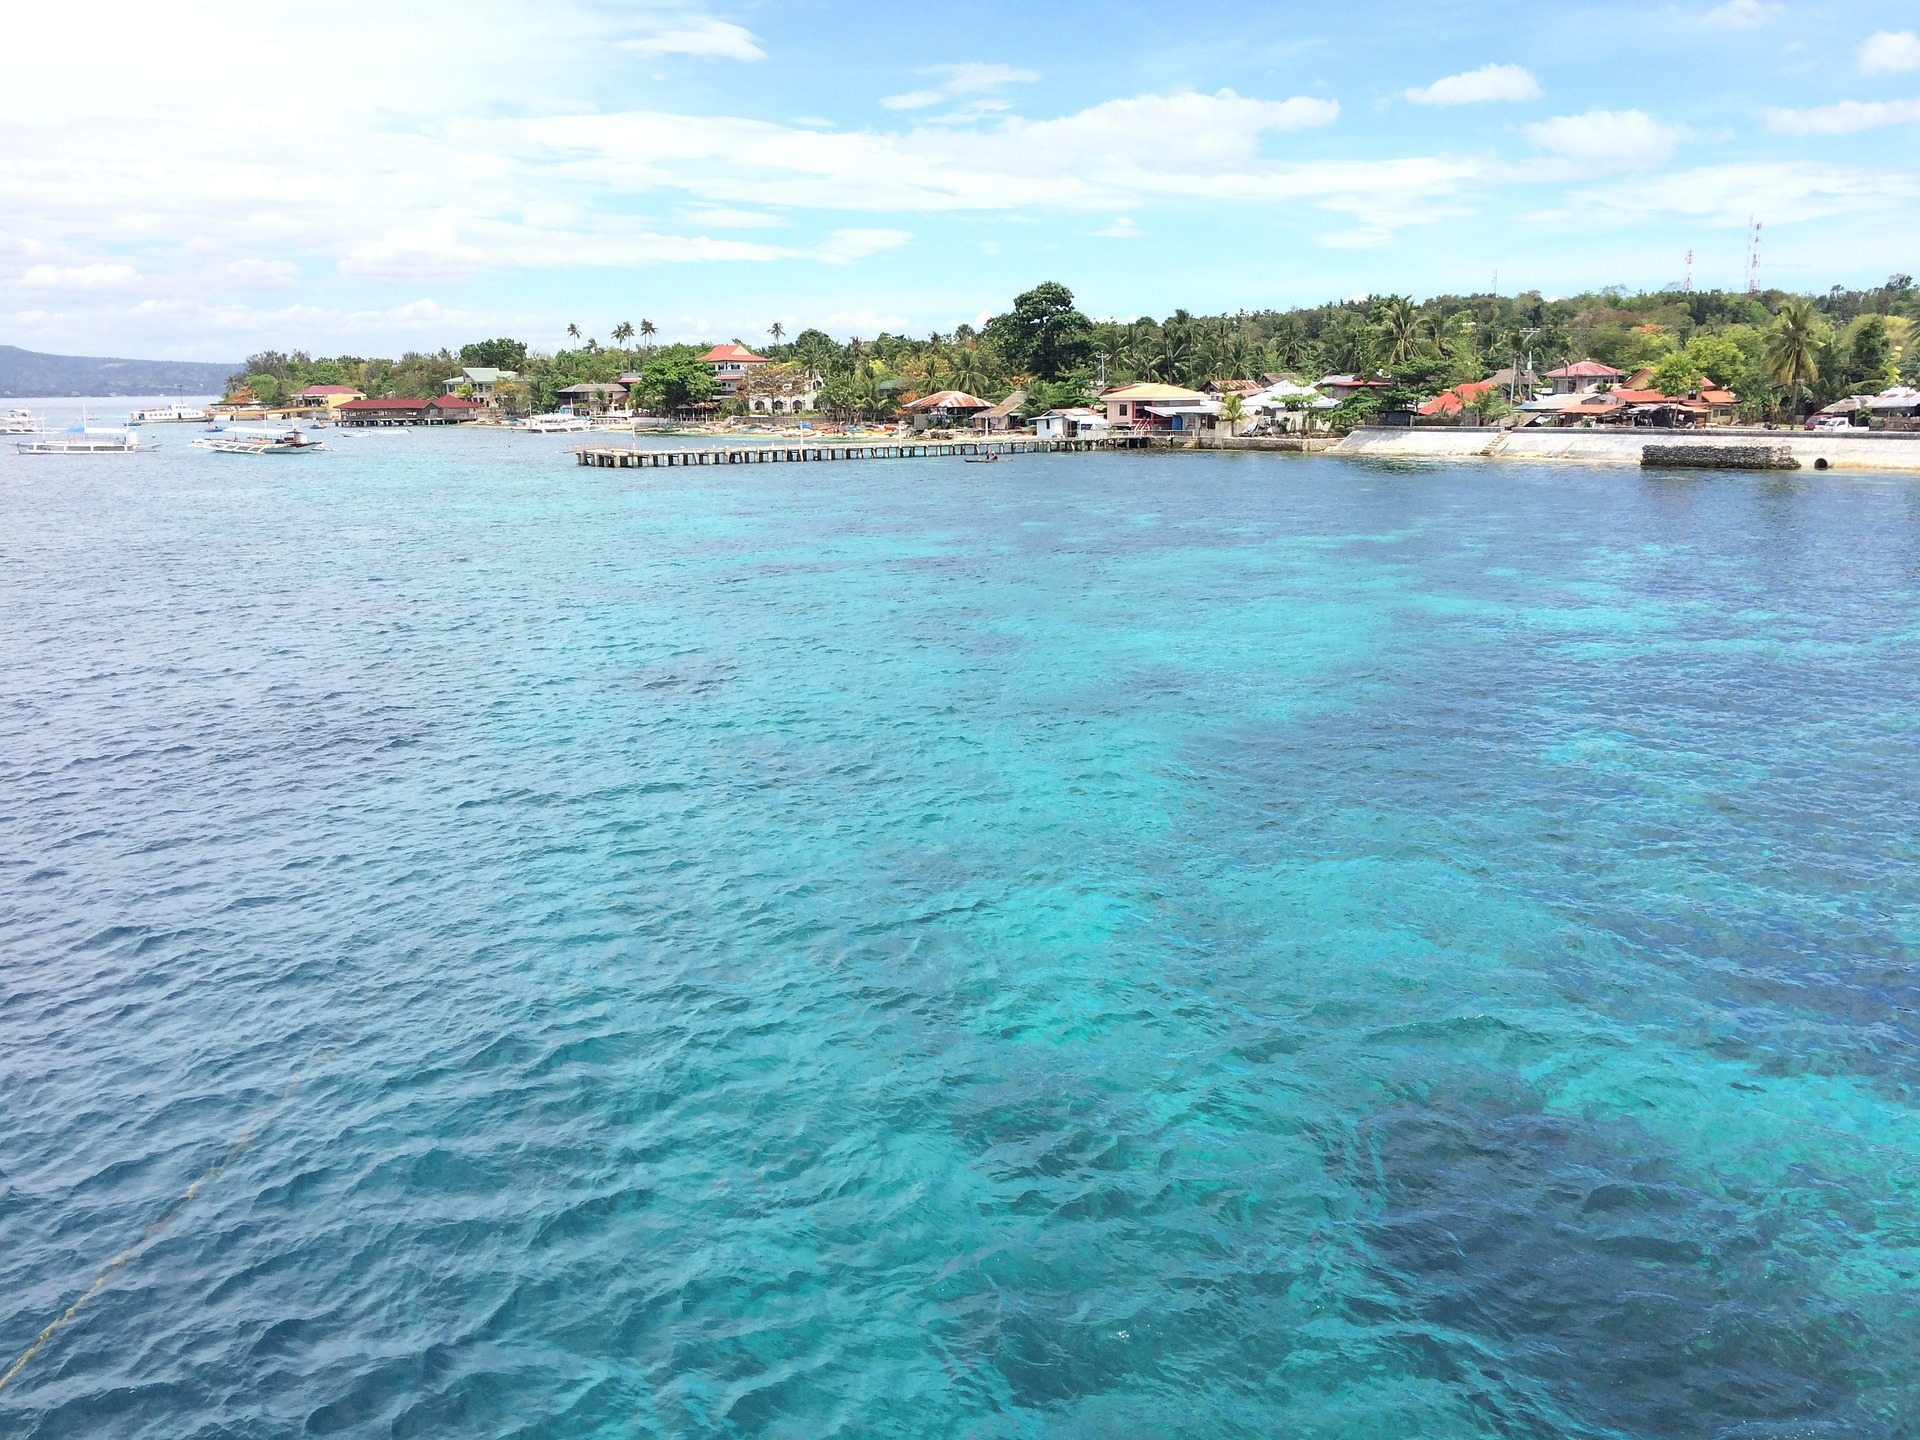 Cebu For The Intrepid Adventurer: Fun Things To Do